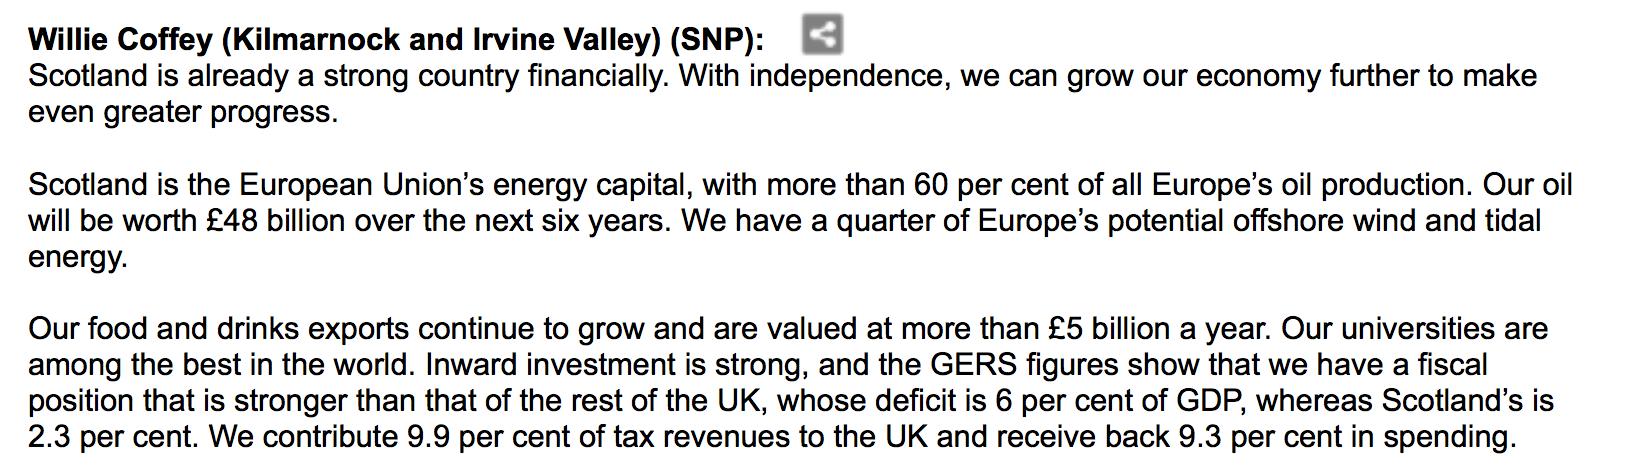 Willie Coffey, SNP MSP, 21/03/2013